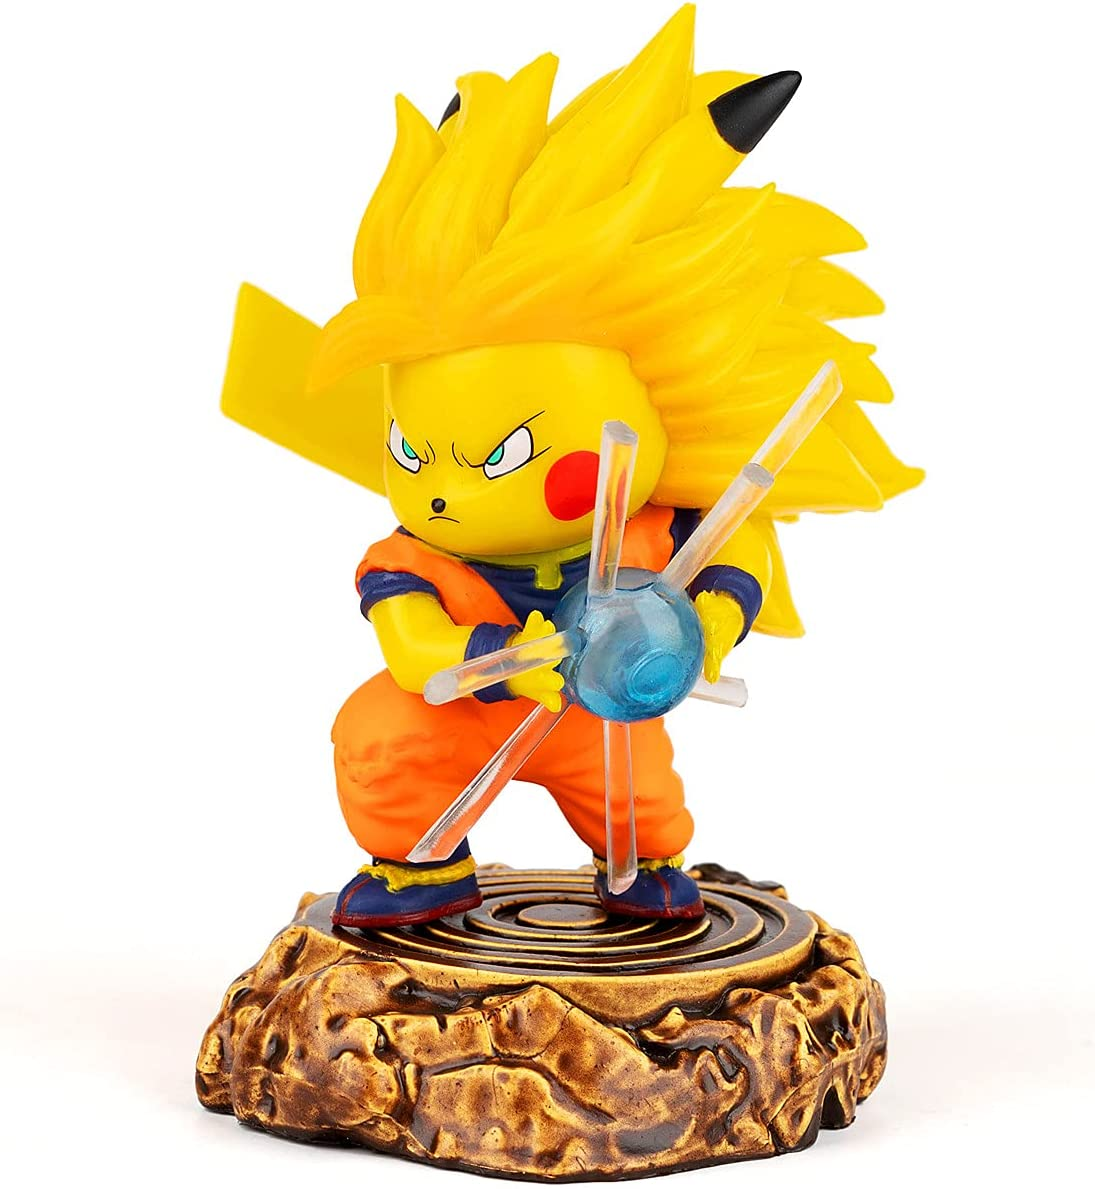 DBZ Action Figure Pikachu Cosplay Goku GK Super Saiyan 3 ssj3...